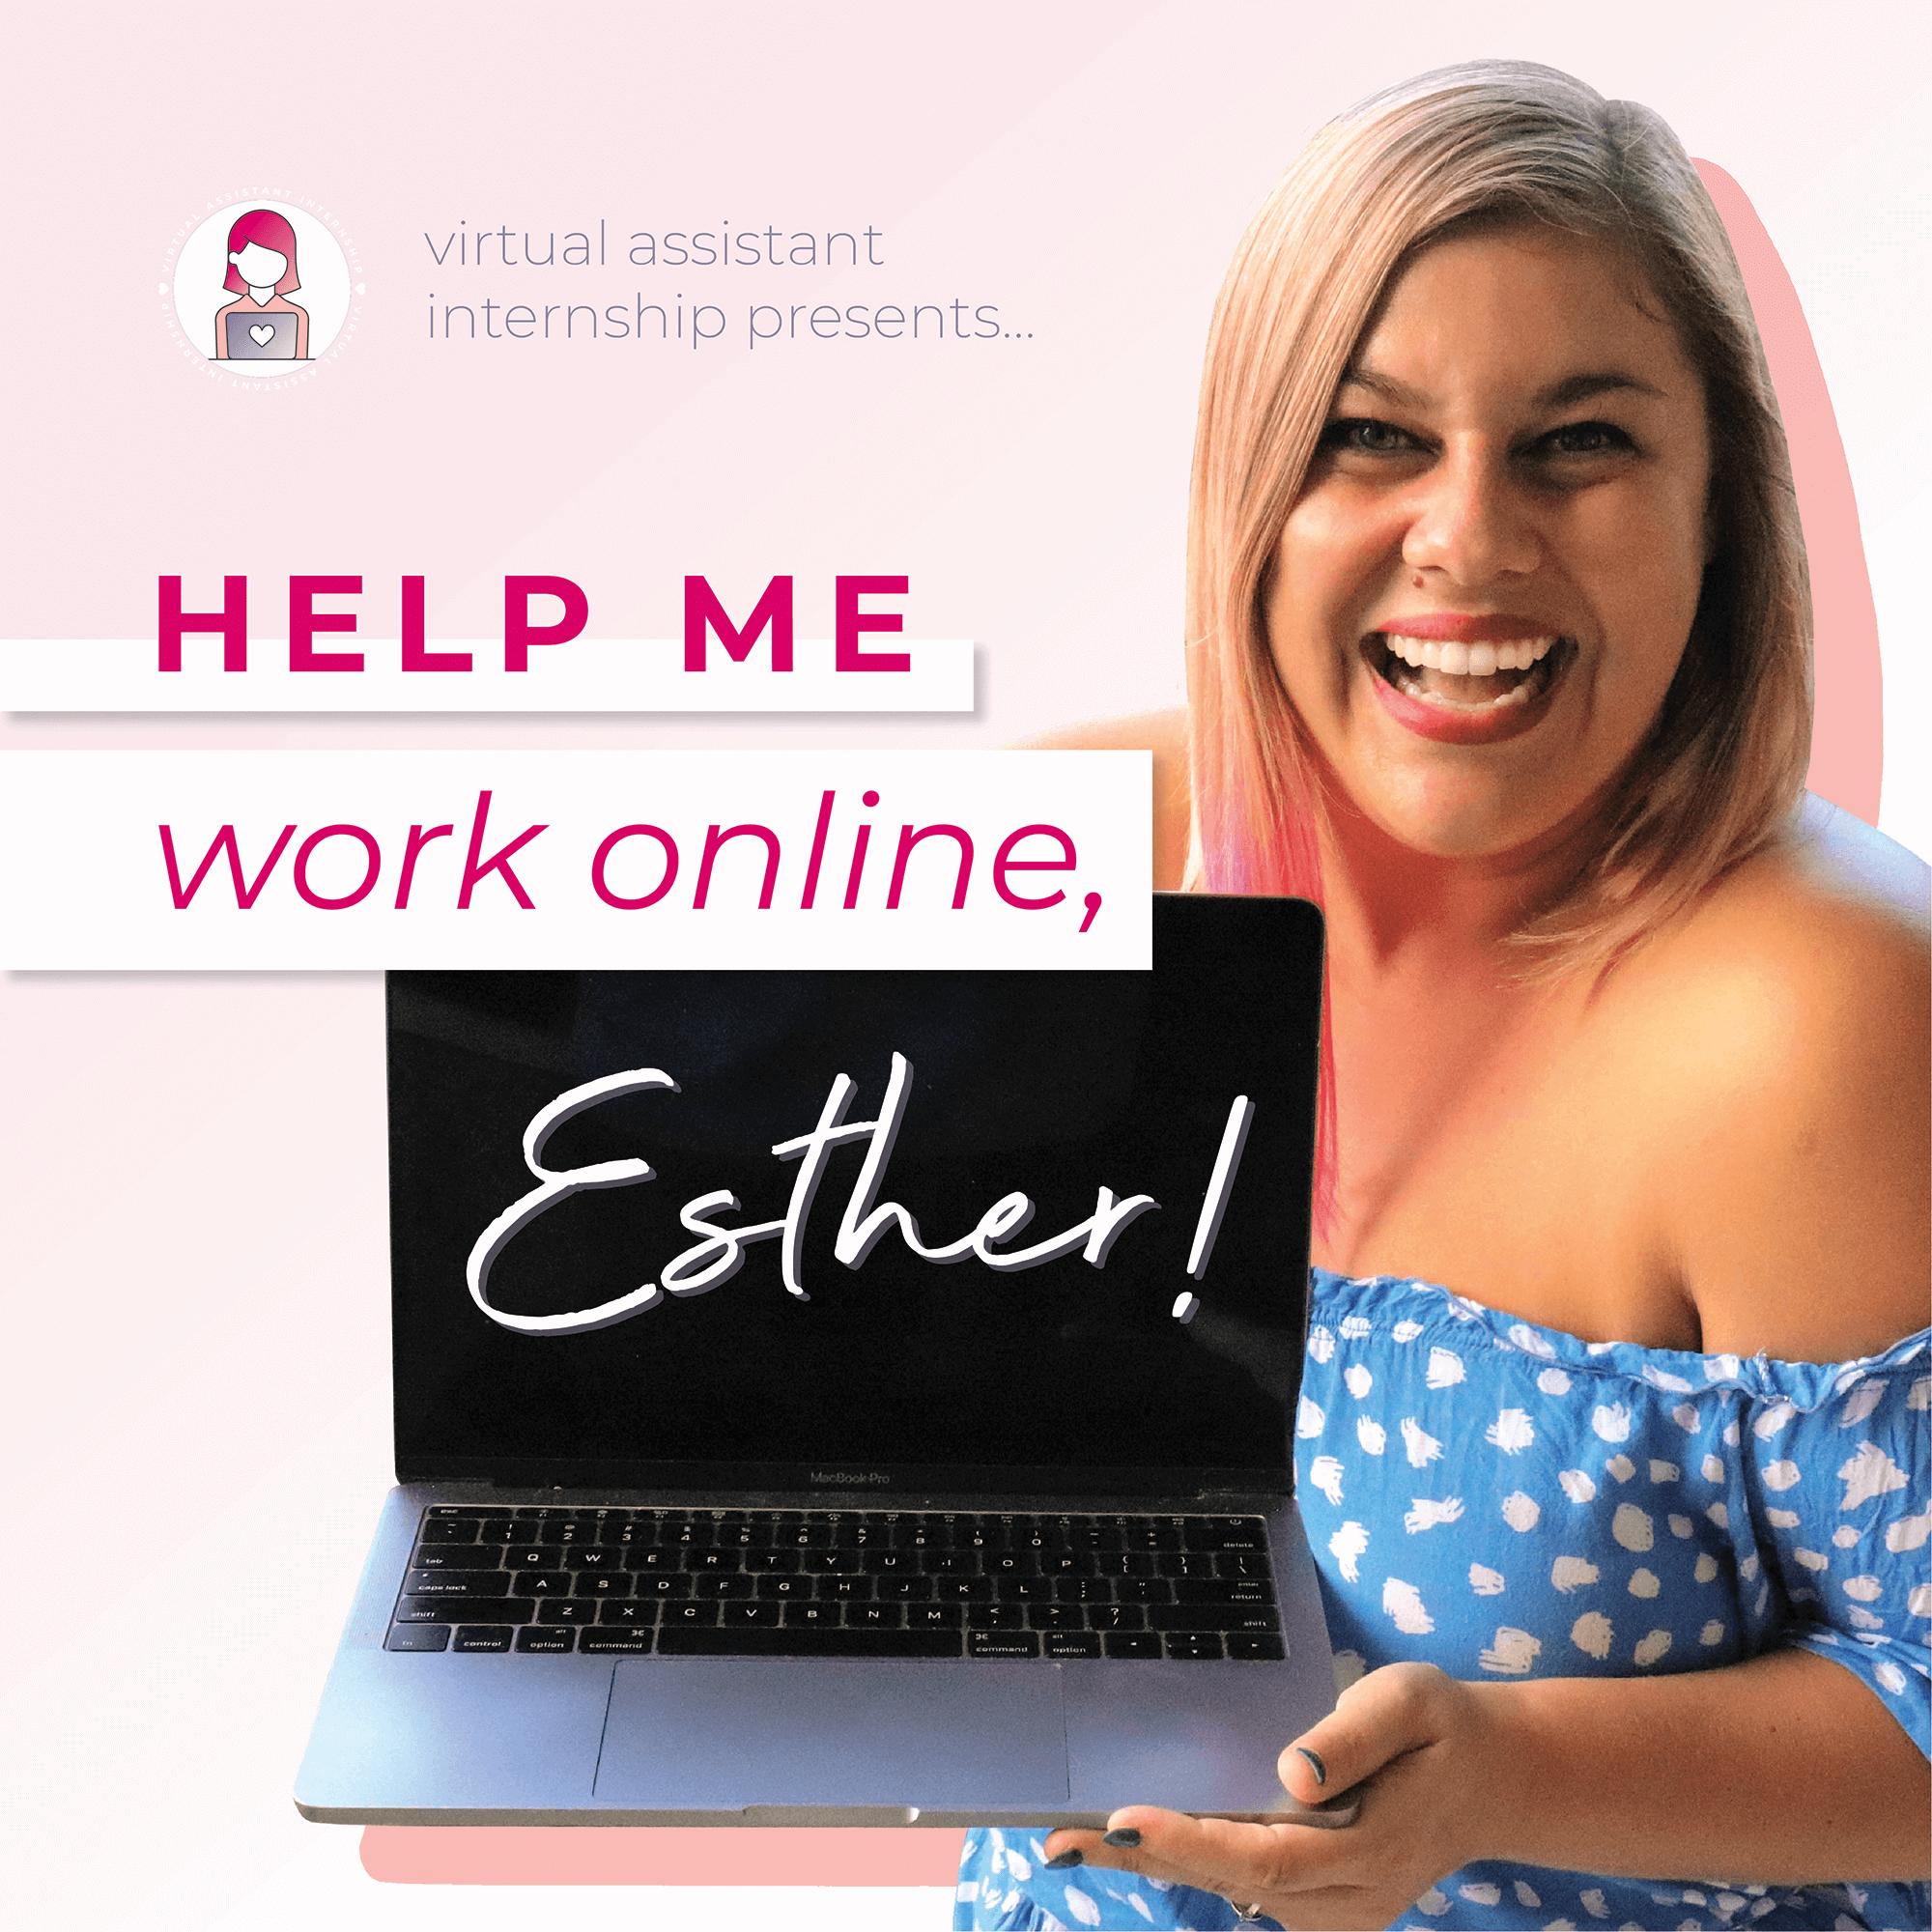 Help Me Work Online, Esther! show art